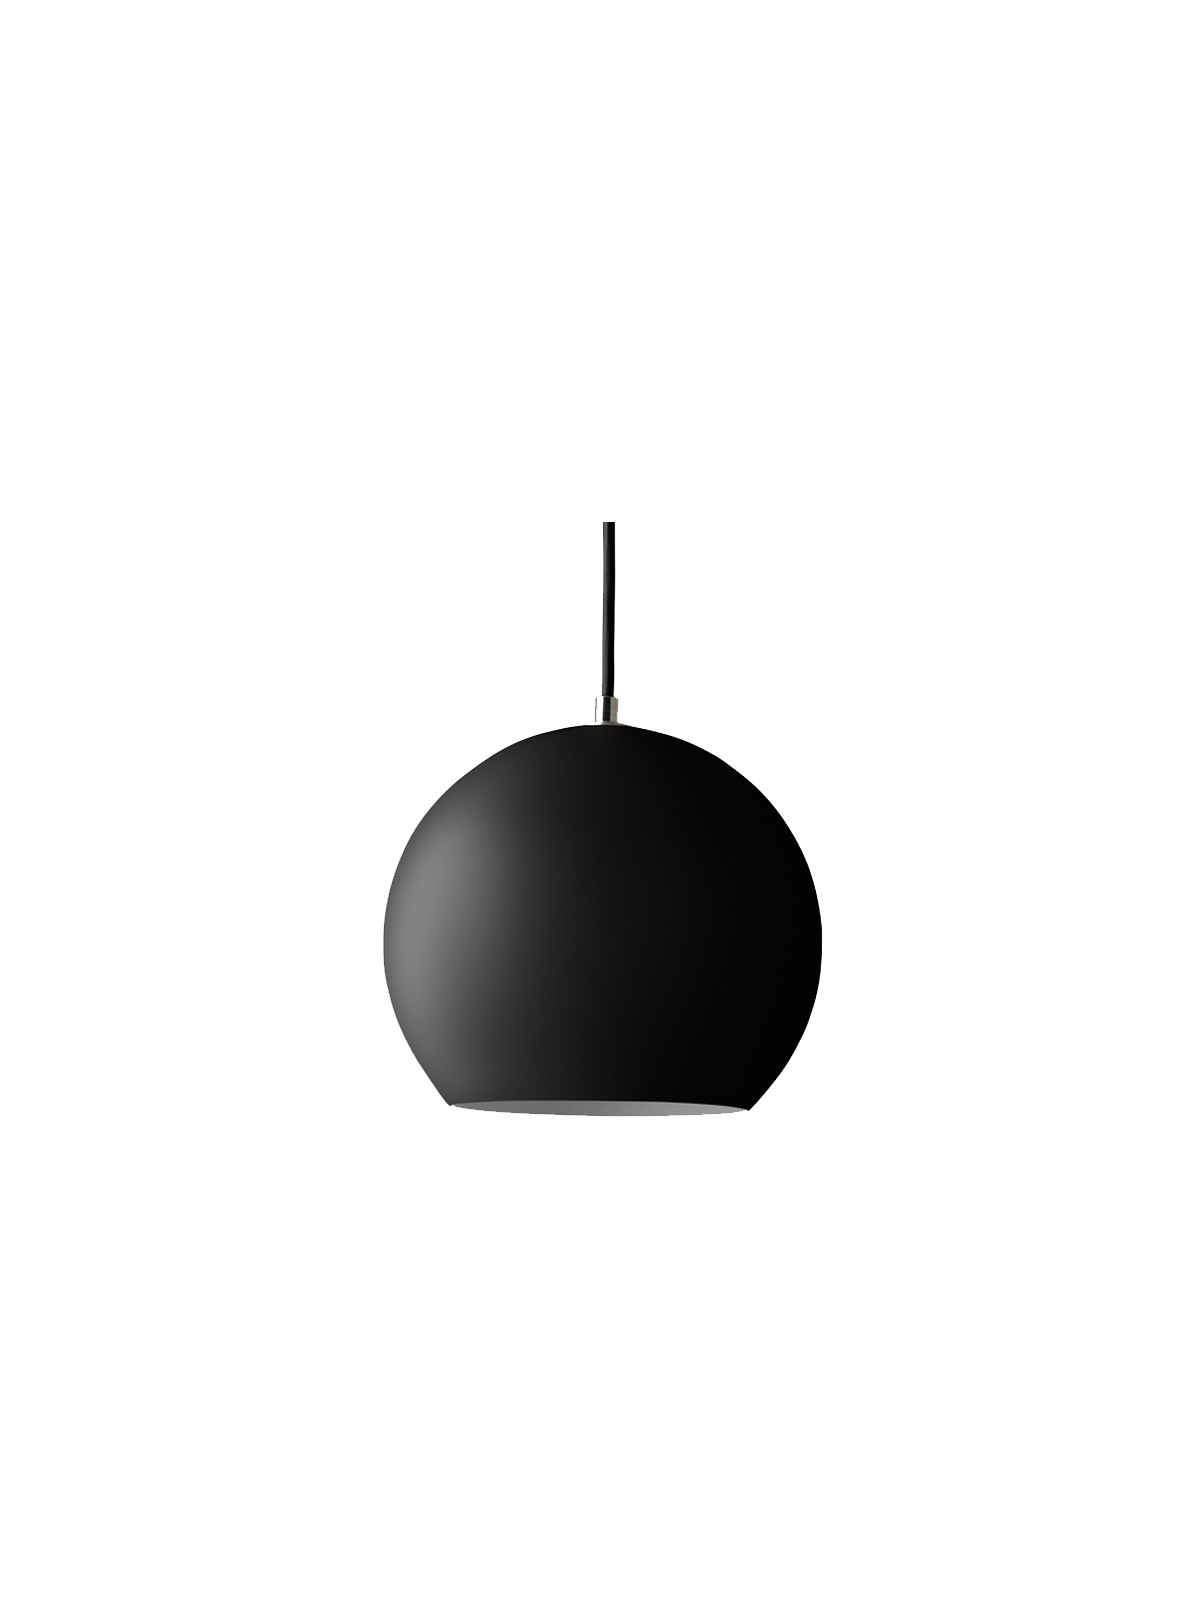 &traditon Topen Leuchte DesignOrt Lampen Berlin Onlineshop